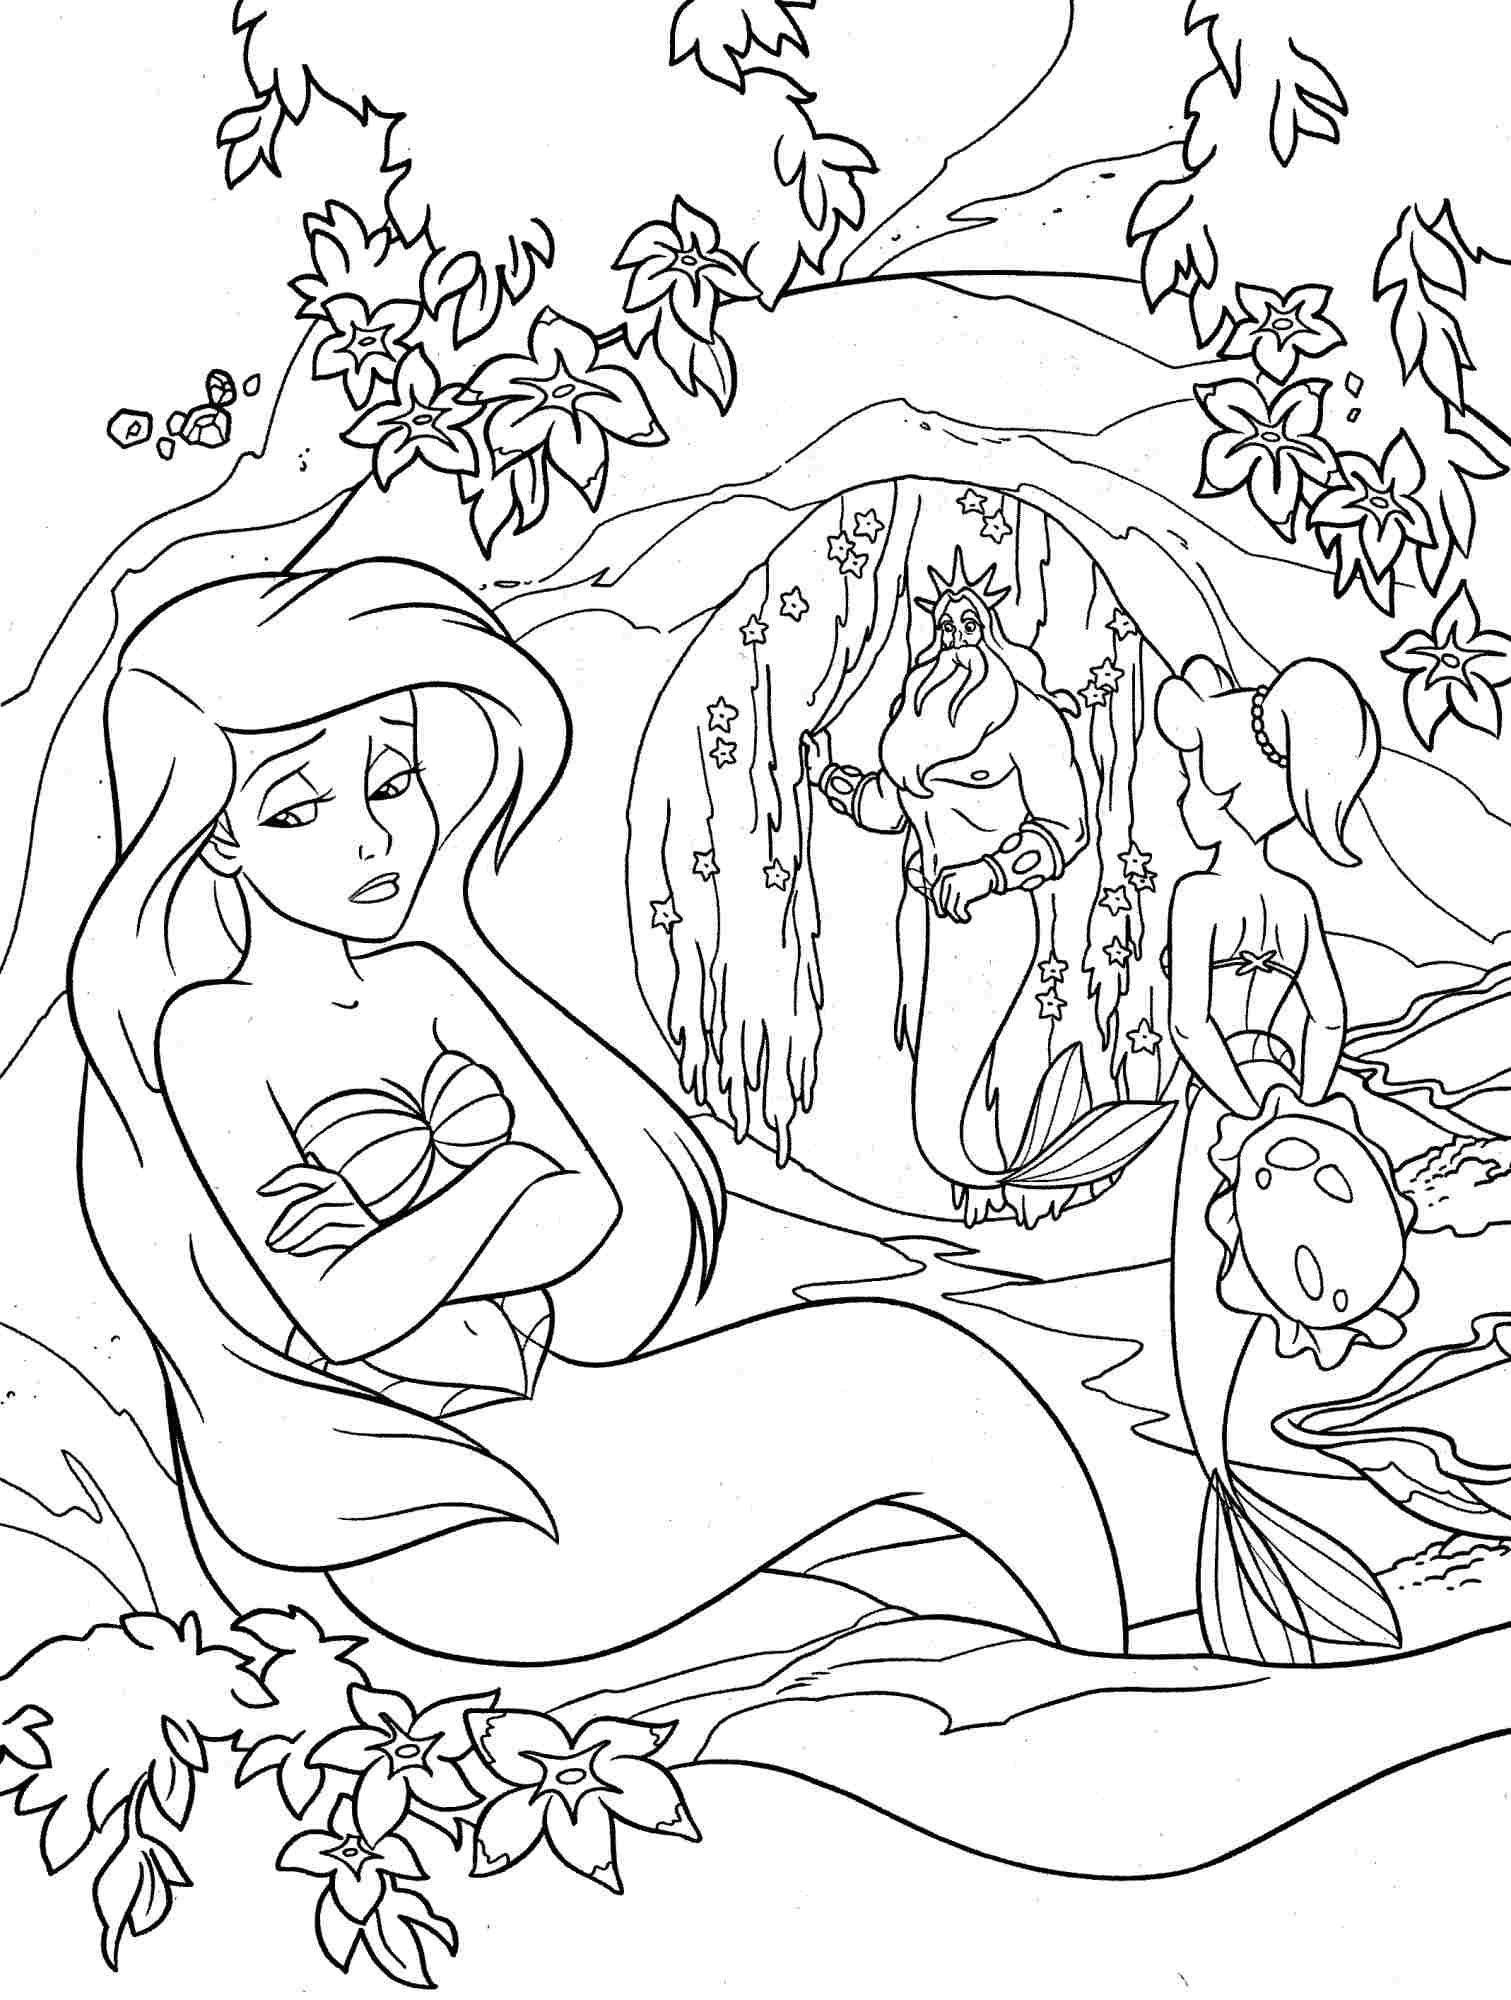 Little Mermaid Coloring Page - youngandtae.com  Pages de